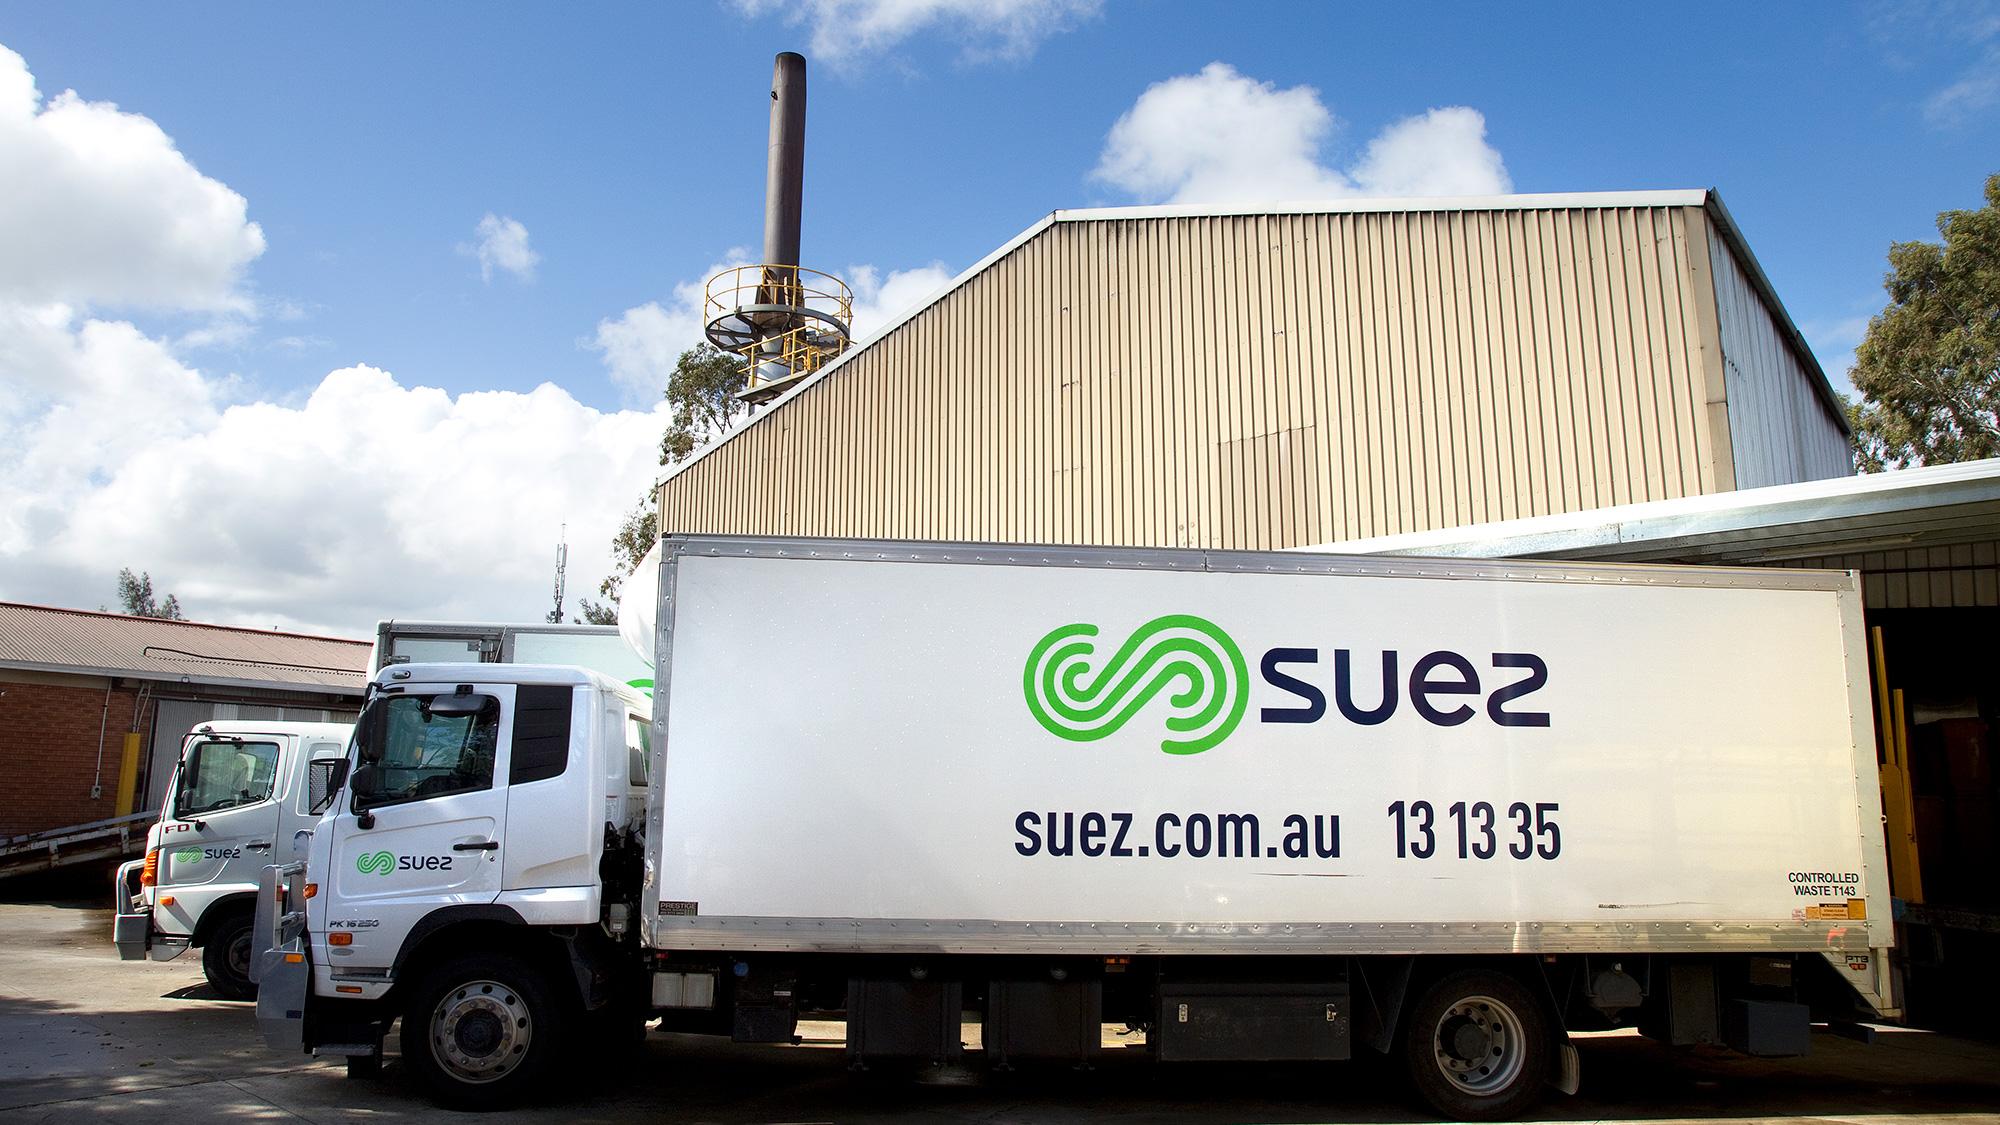 SUEZ Medical Waste Facilities header image. Image of SUEZ medical pantech trucks outside Welshpool Medical Waste Facility, Perth.